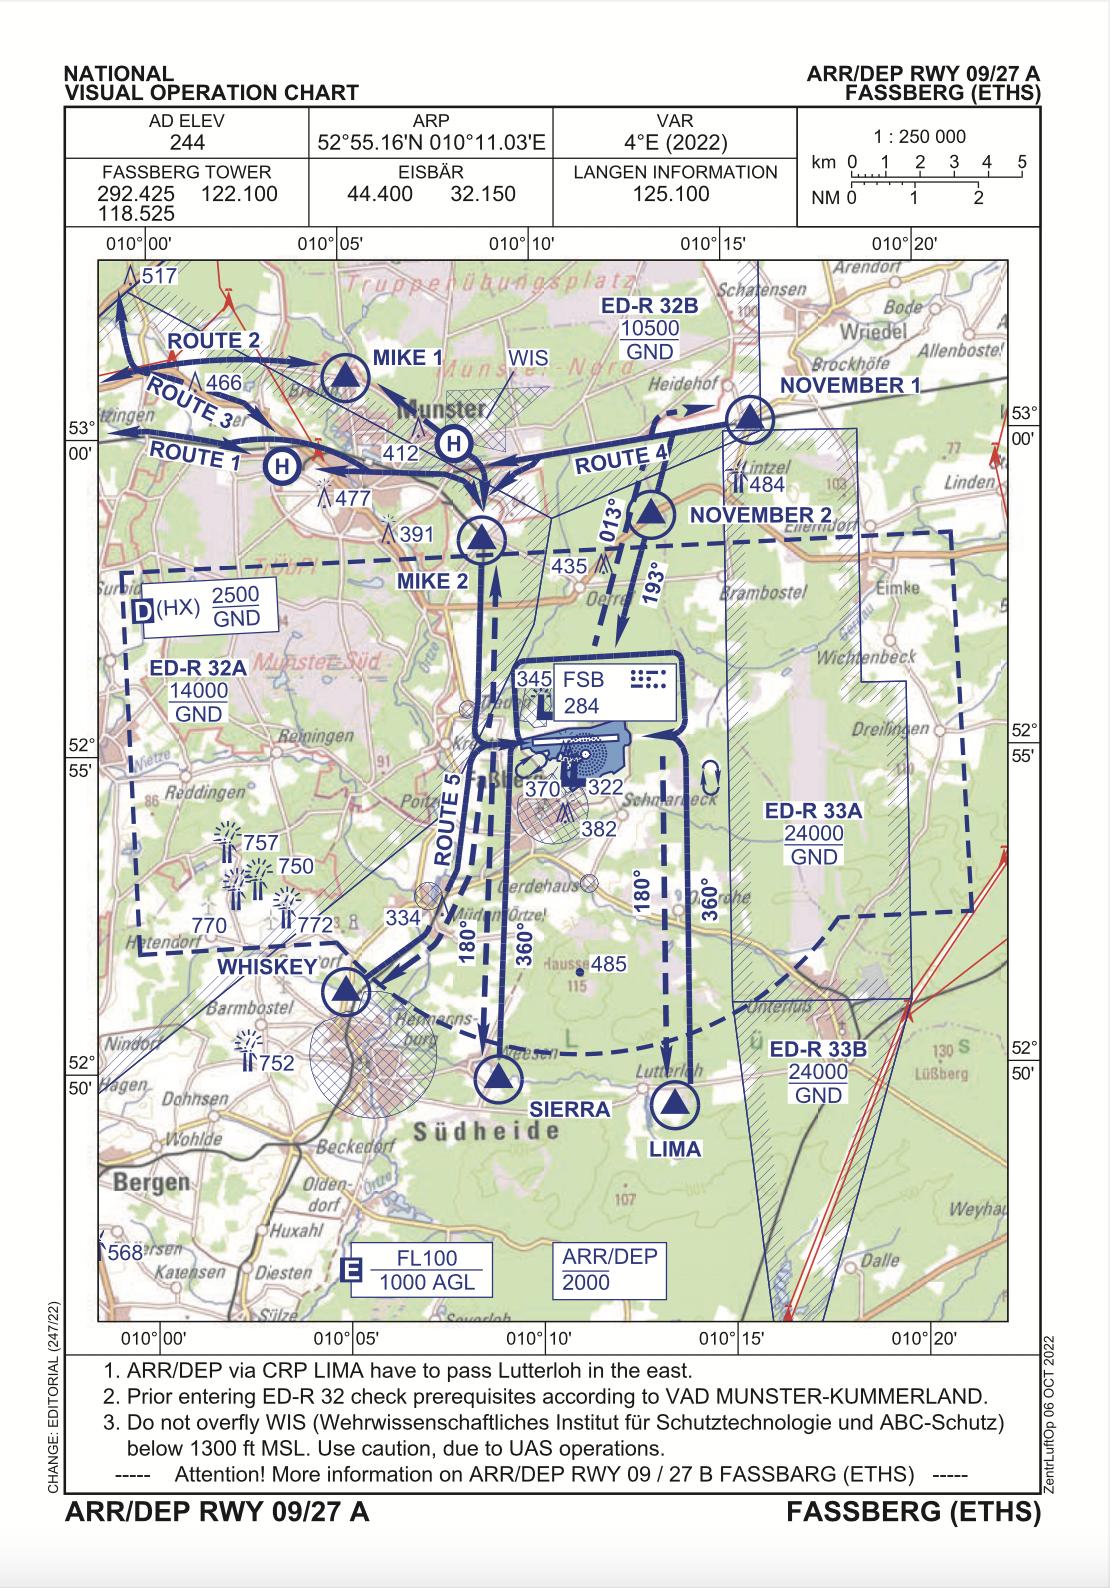 ETHS - Visual Operation Chart - 1